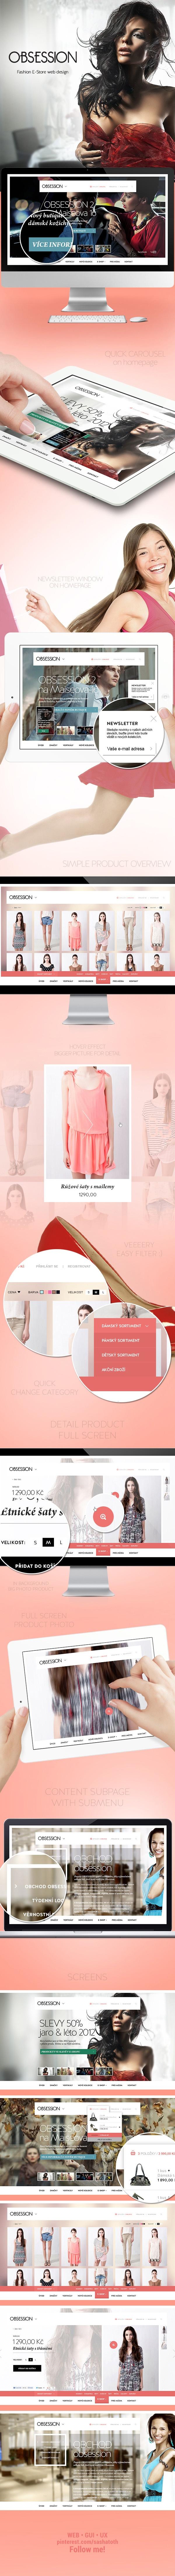 Obsession - Fashion E-Store web design by Jan Vašek, via Behance